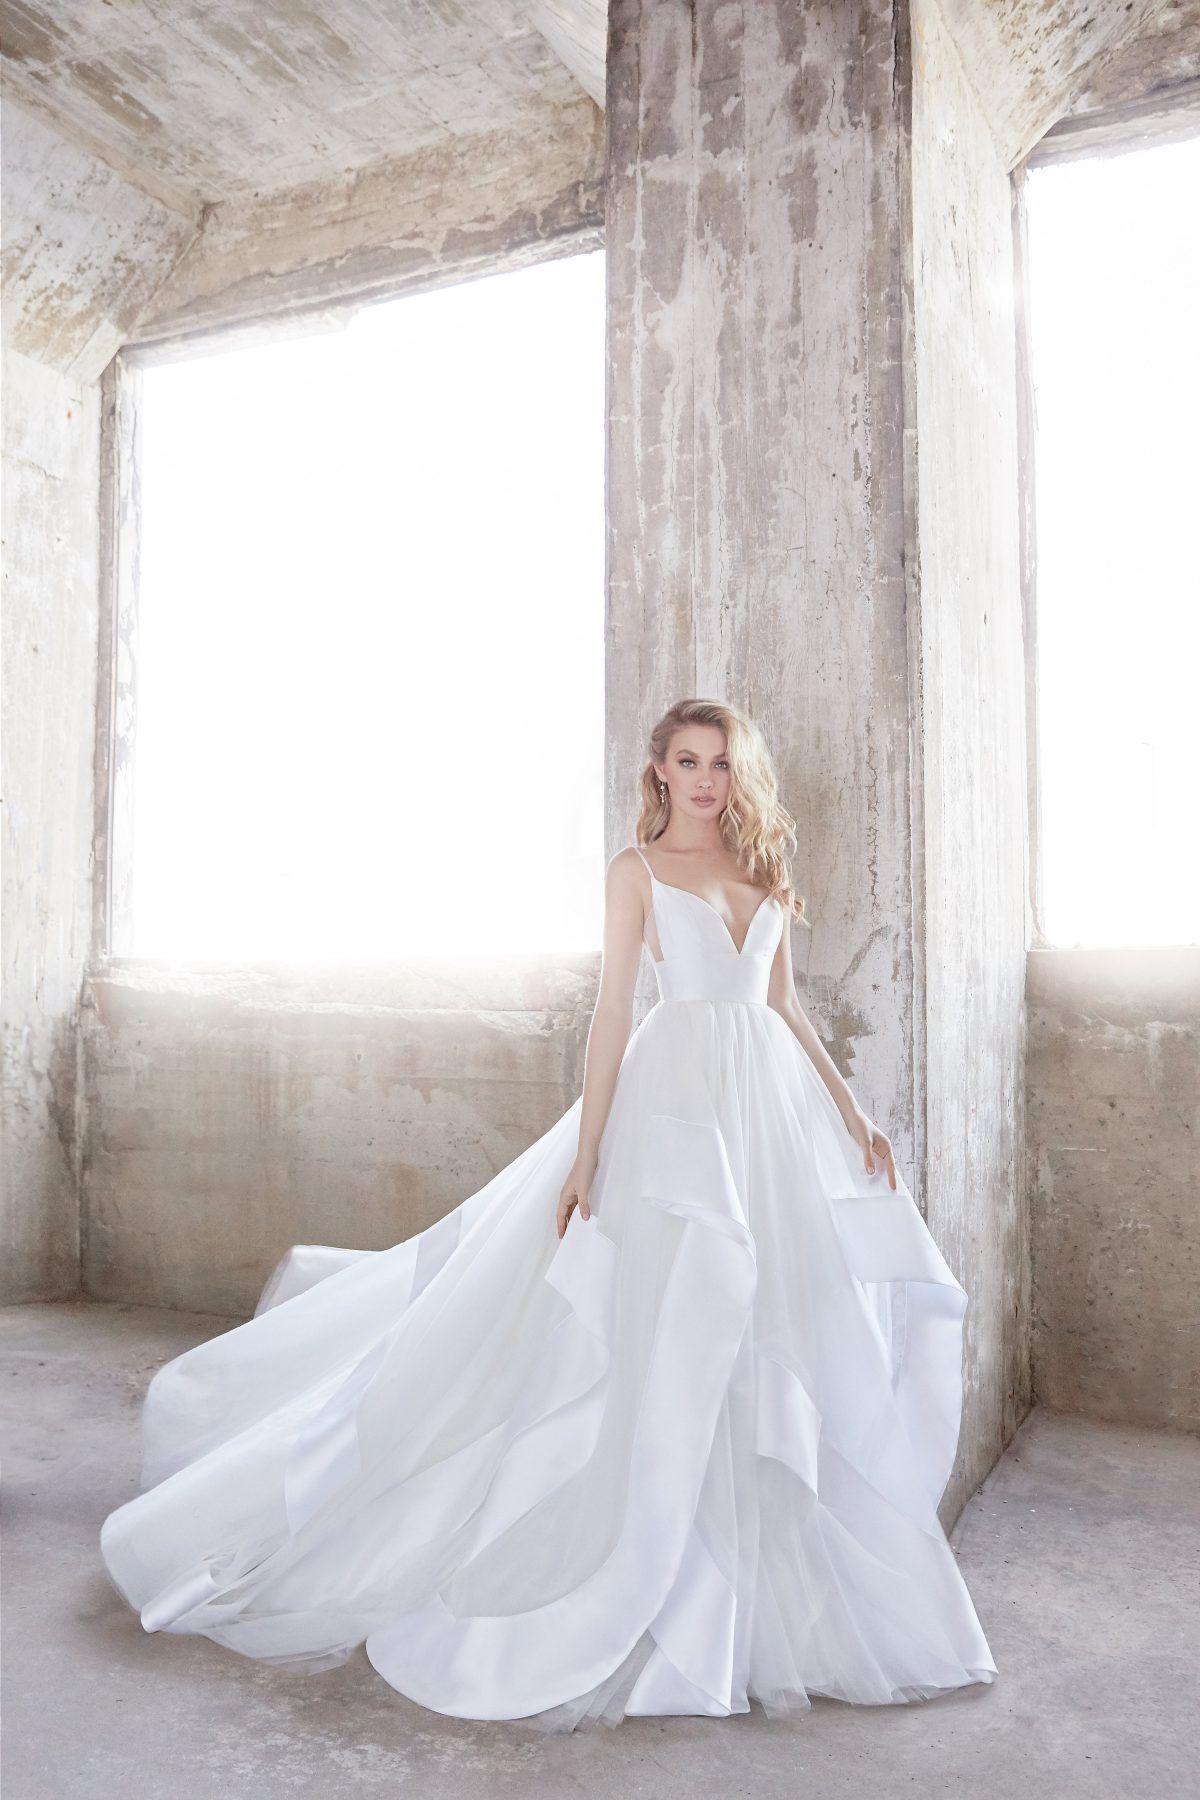 Hayley paige dori wedding dress  Romantic Ball Gown Wedding Dress by Hayley Paige  Image  zoomed in